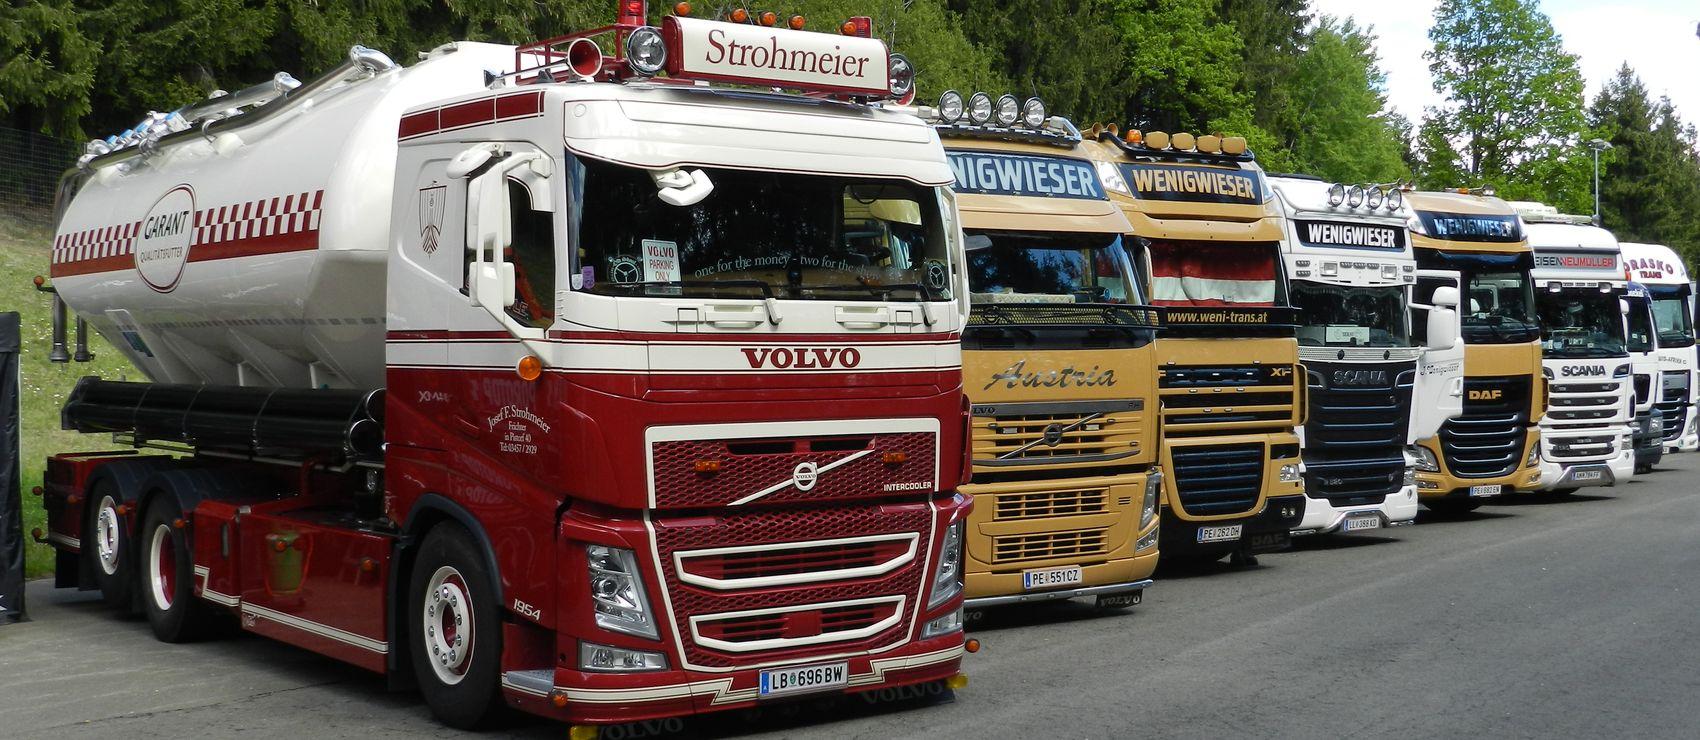 http://www.lkw-thorsten.eu/wp-content/uploads/2017/05/Lkw-Thorsten_Lkw-Fotos_Lkw-Infos_Lkw-Thorsten_TV_Spielberg_Truck_Race_Trophy.jpg